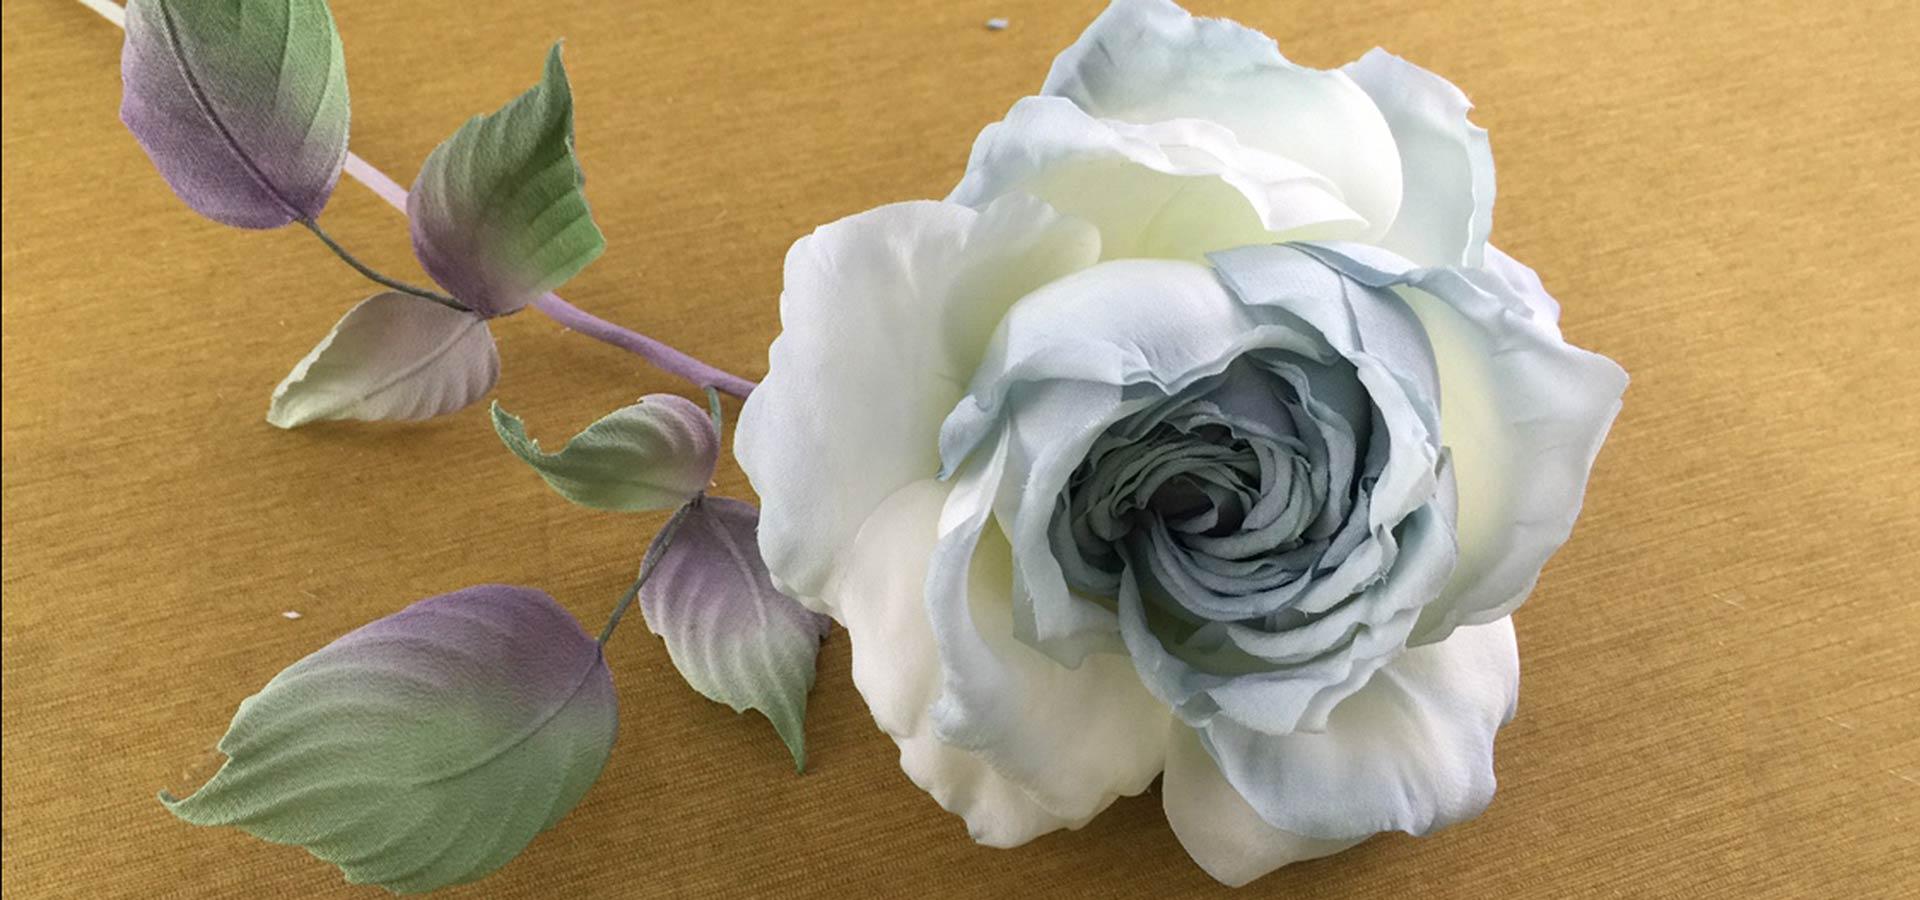 jp1-silk-rose-golubaya